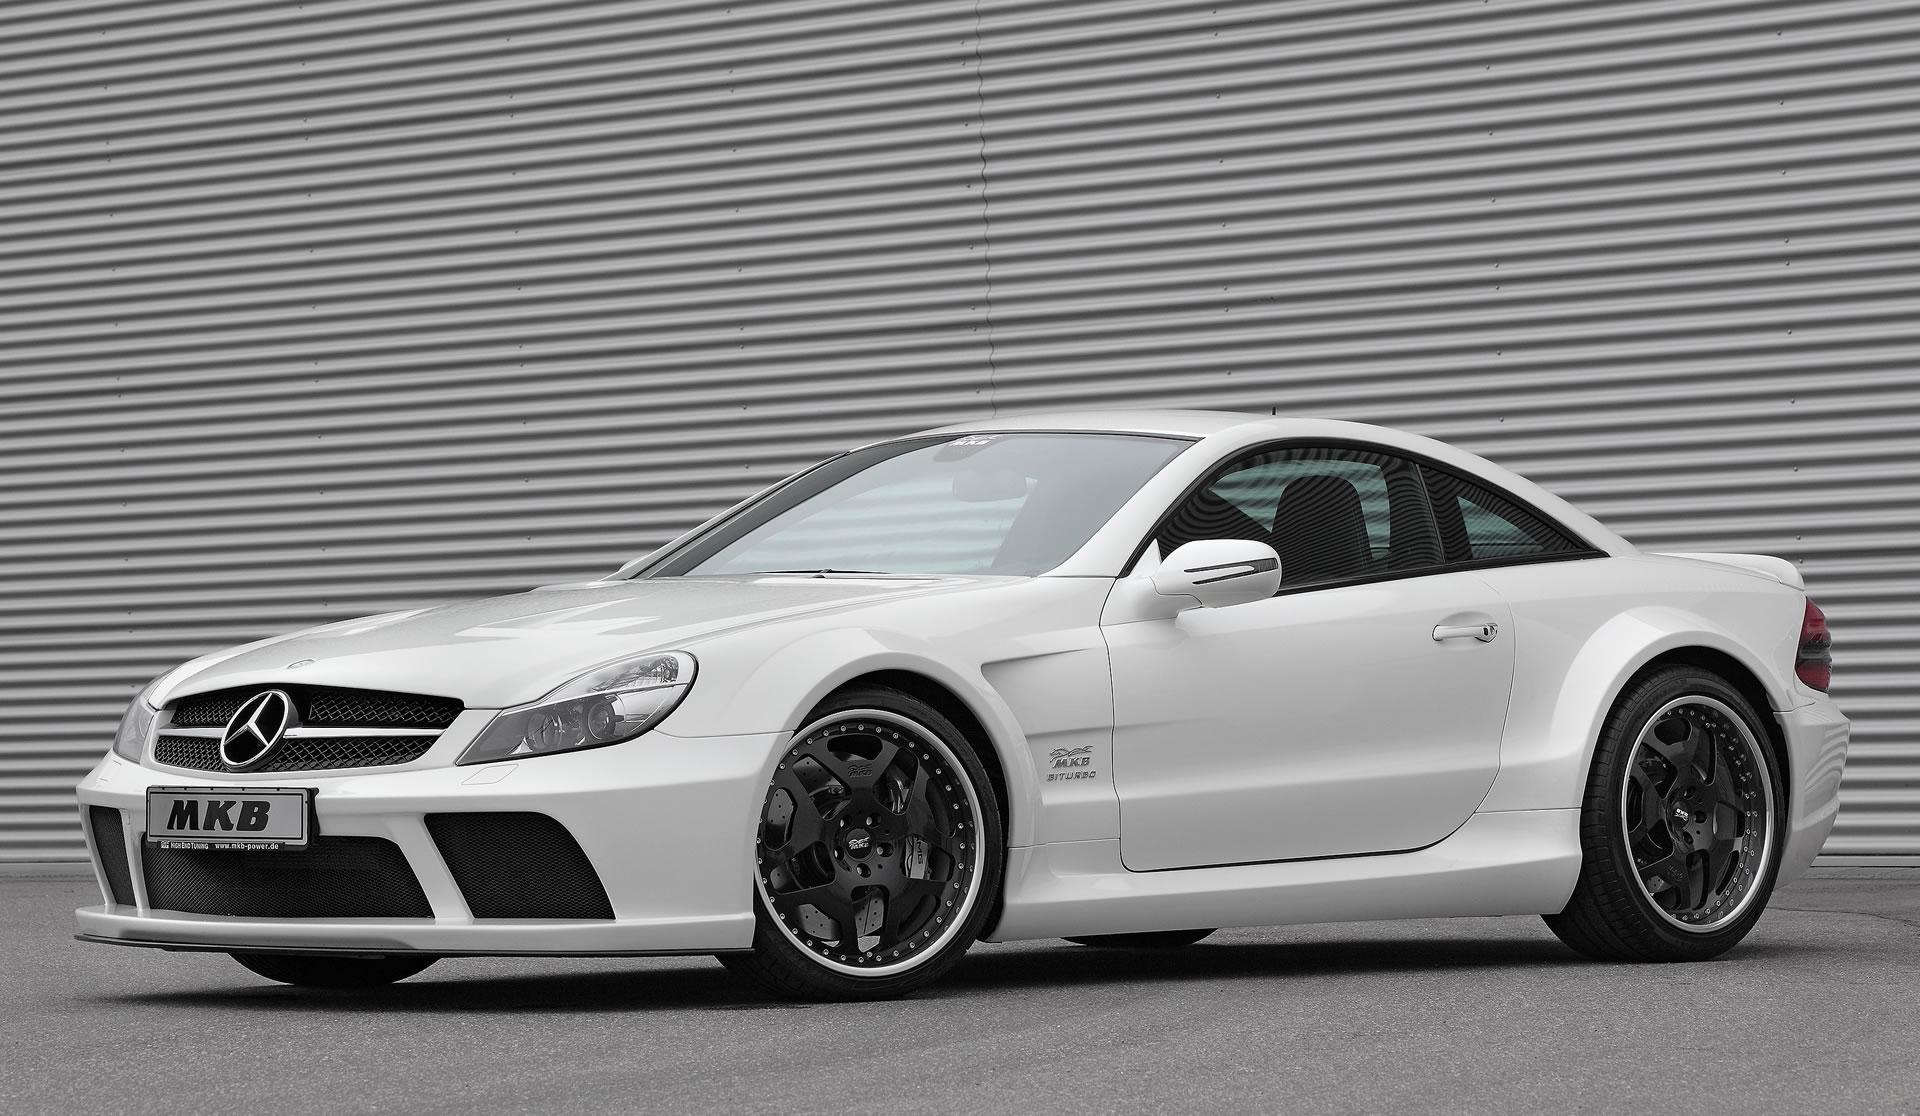 Mkb Mercedes Benz Sl 65 Amg Black Series P 1000